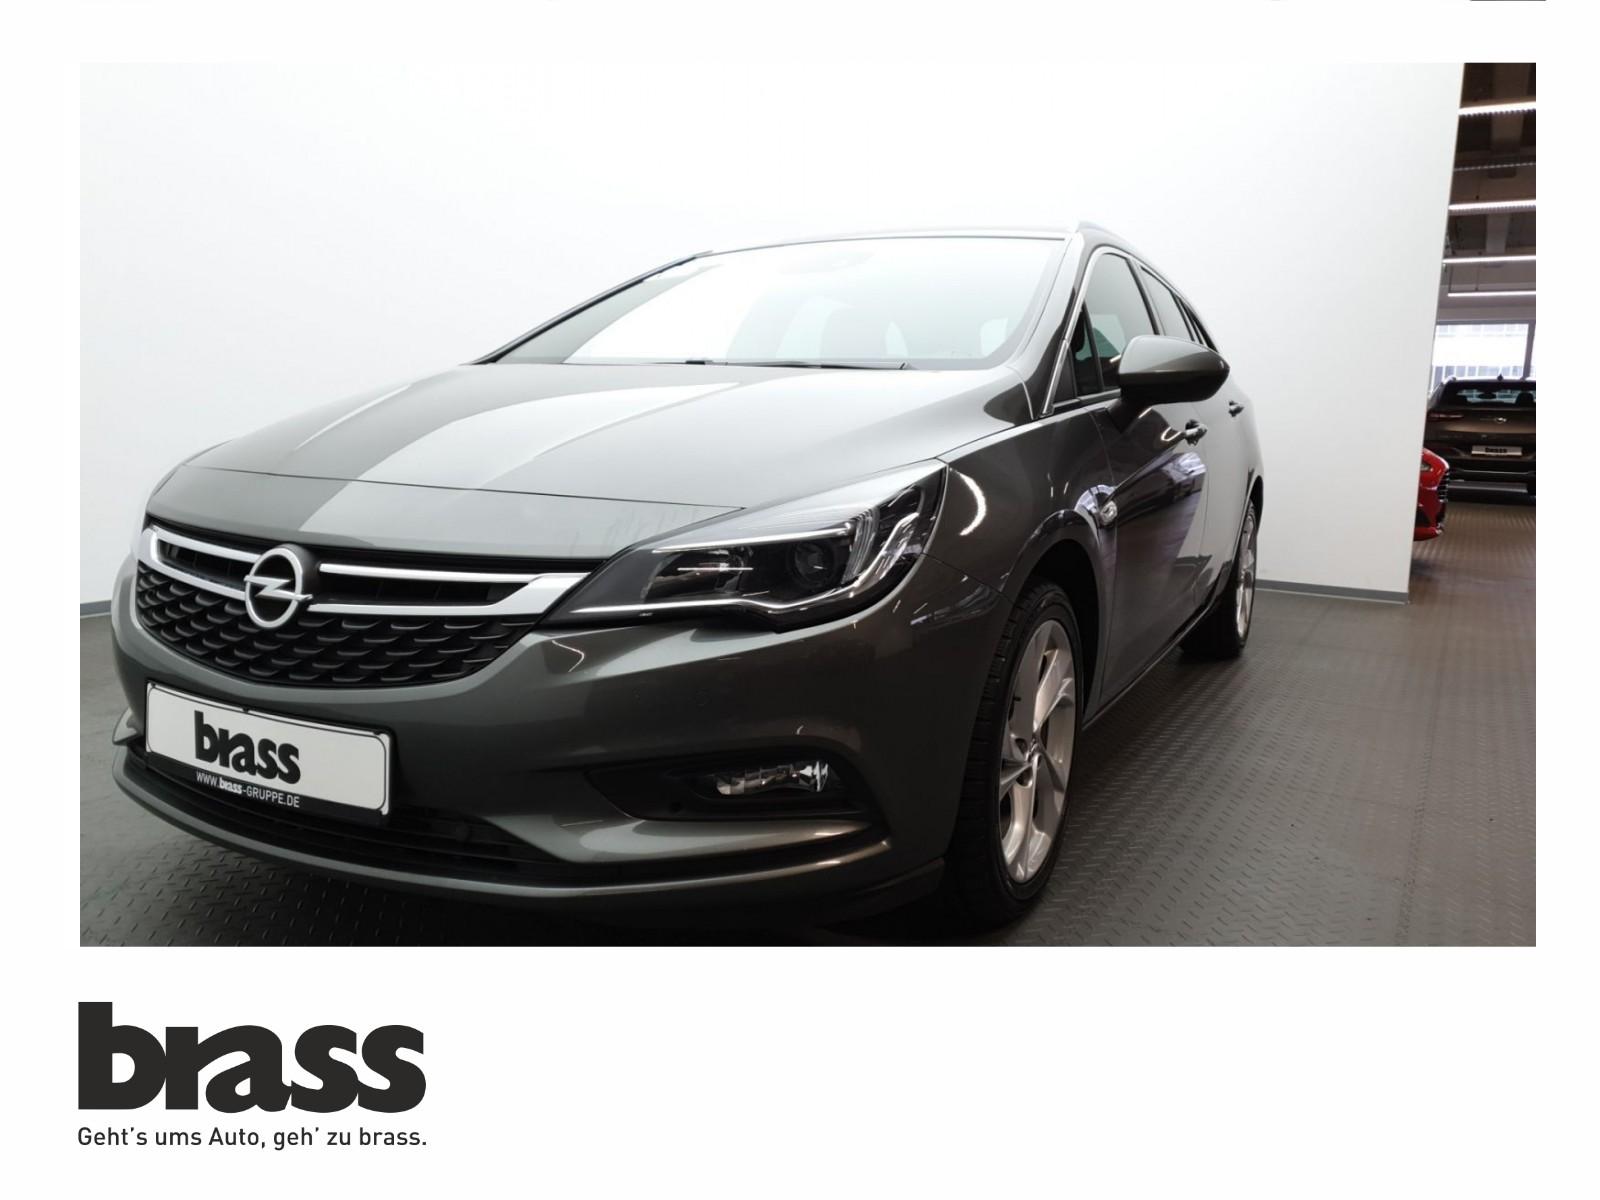 Opel Astra | 227537